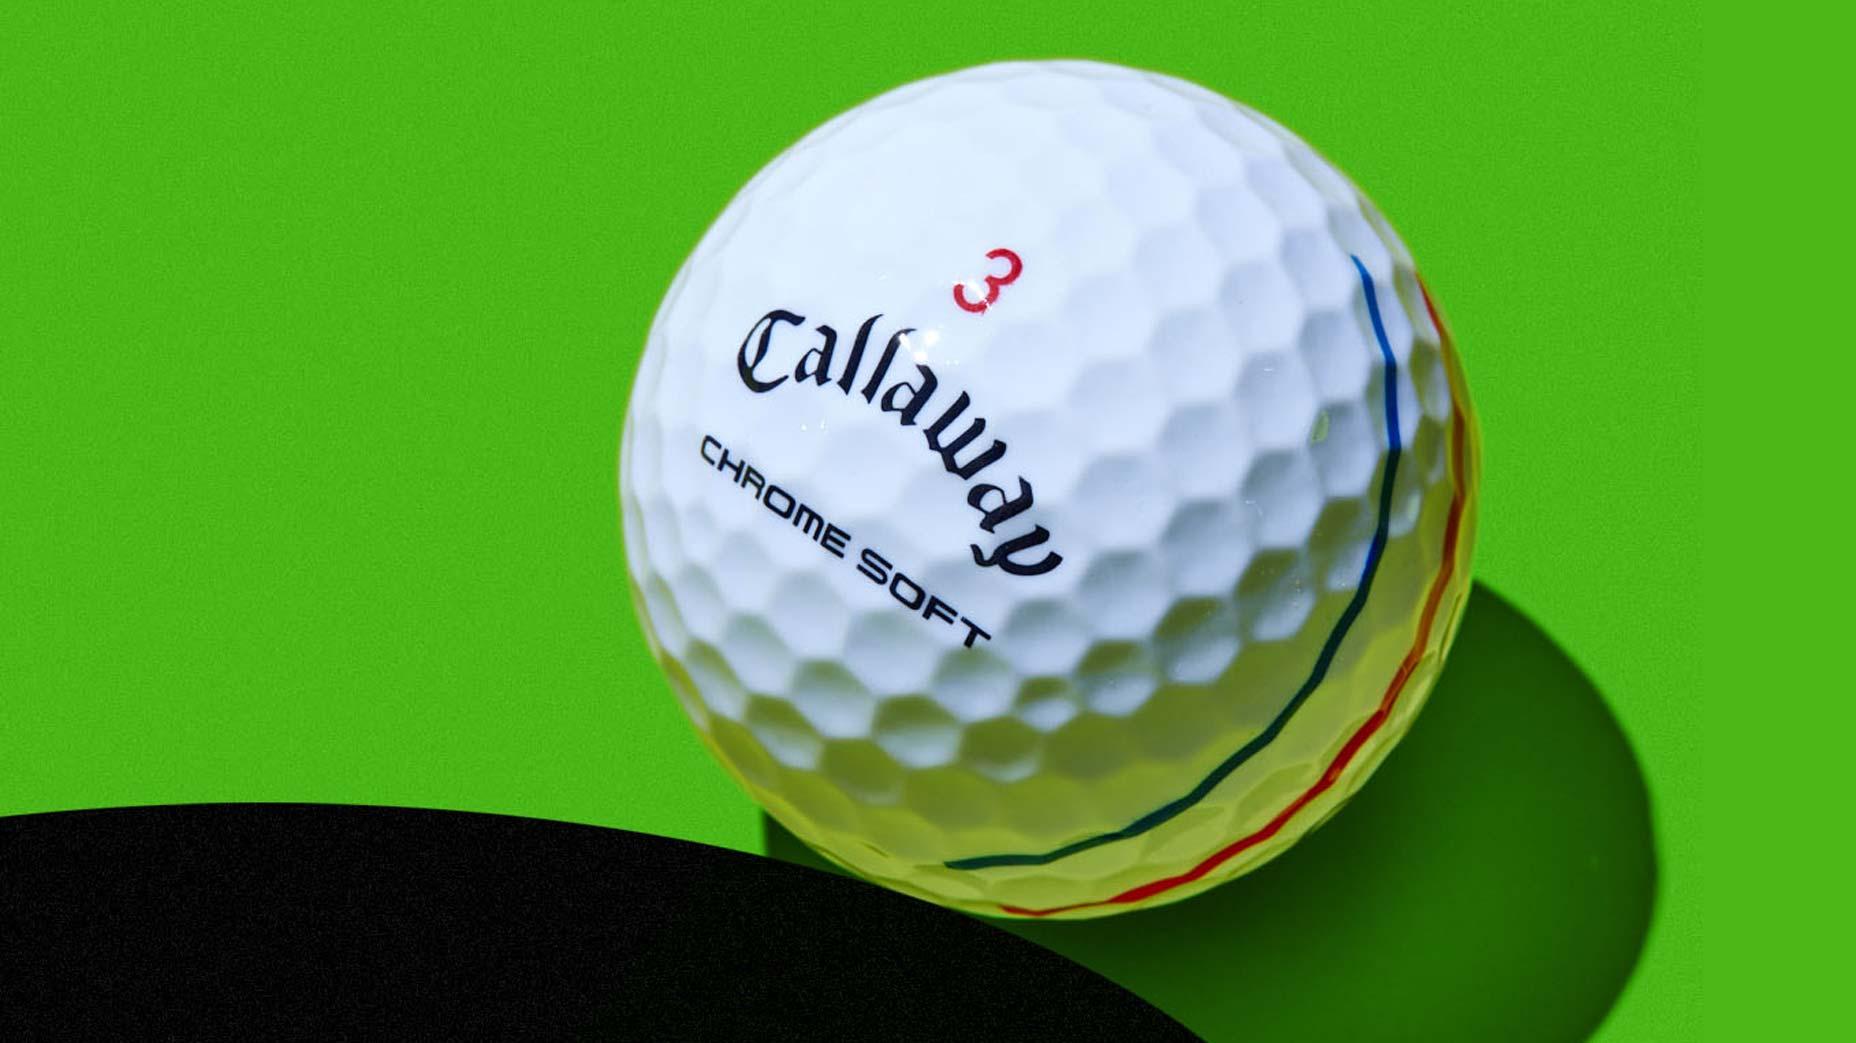 A Callaway Chrome Soft Triple Track golf ball against a green background